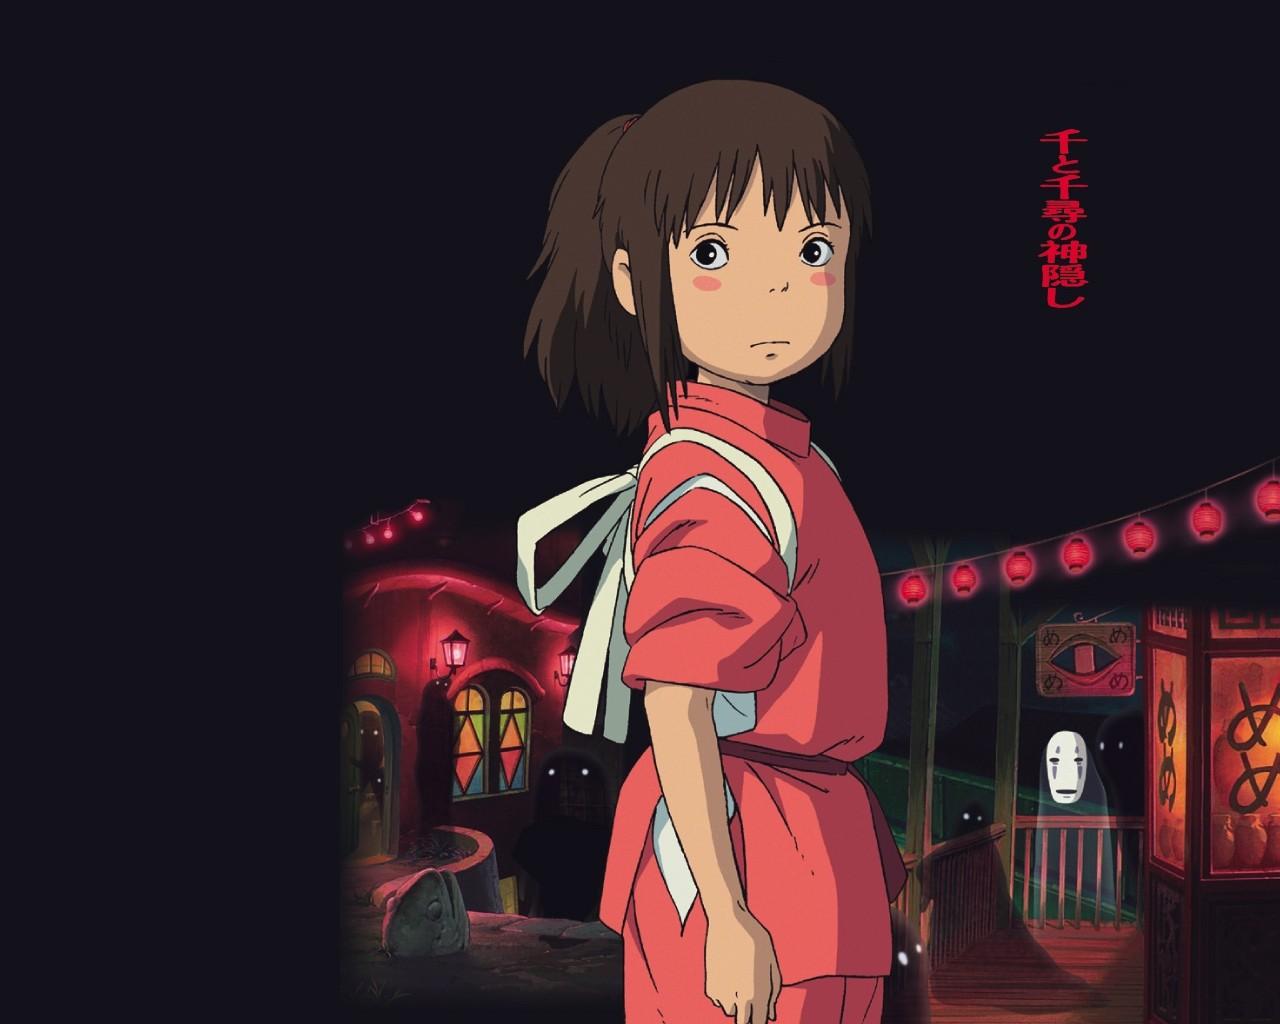 Titre original 千と千尋の神隠し Sen to Chihiro no kamikakushi Titre français Le Voyage de Chihiro Titre international Spirited Away